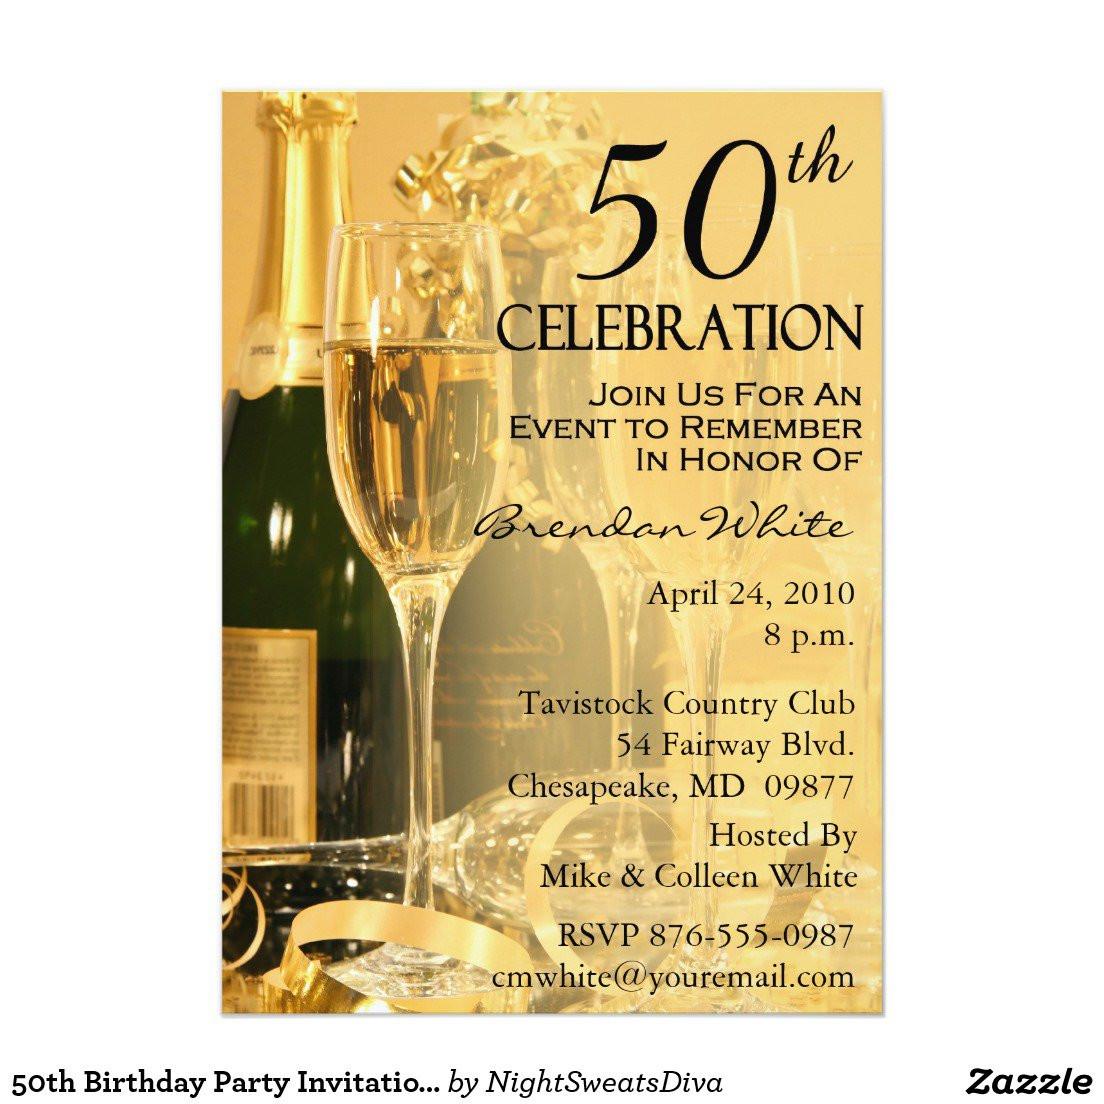 50th Birthday Invitations For Her  Invitation 50th Birthday Party